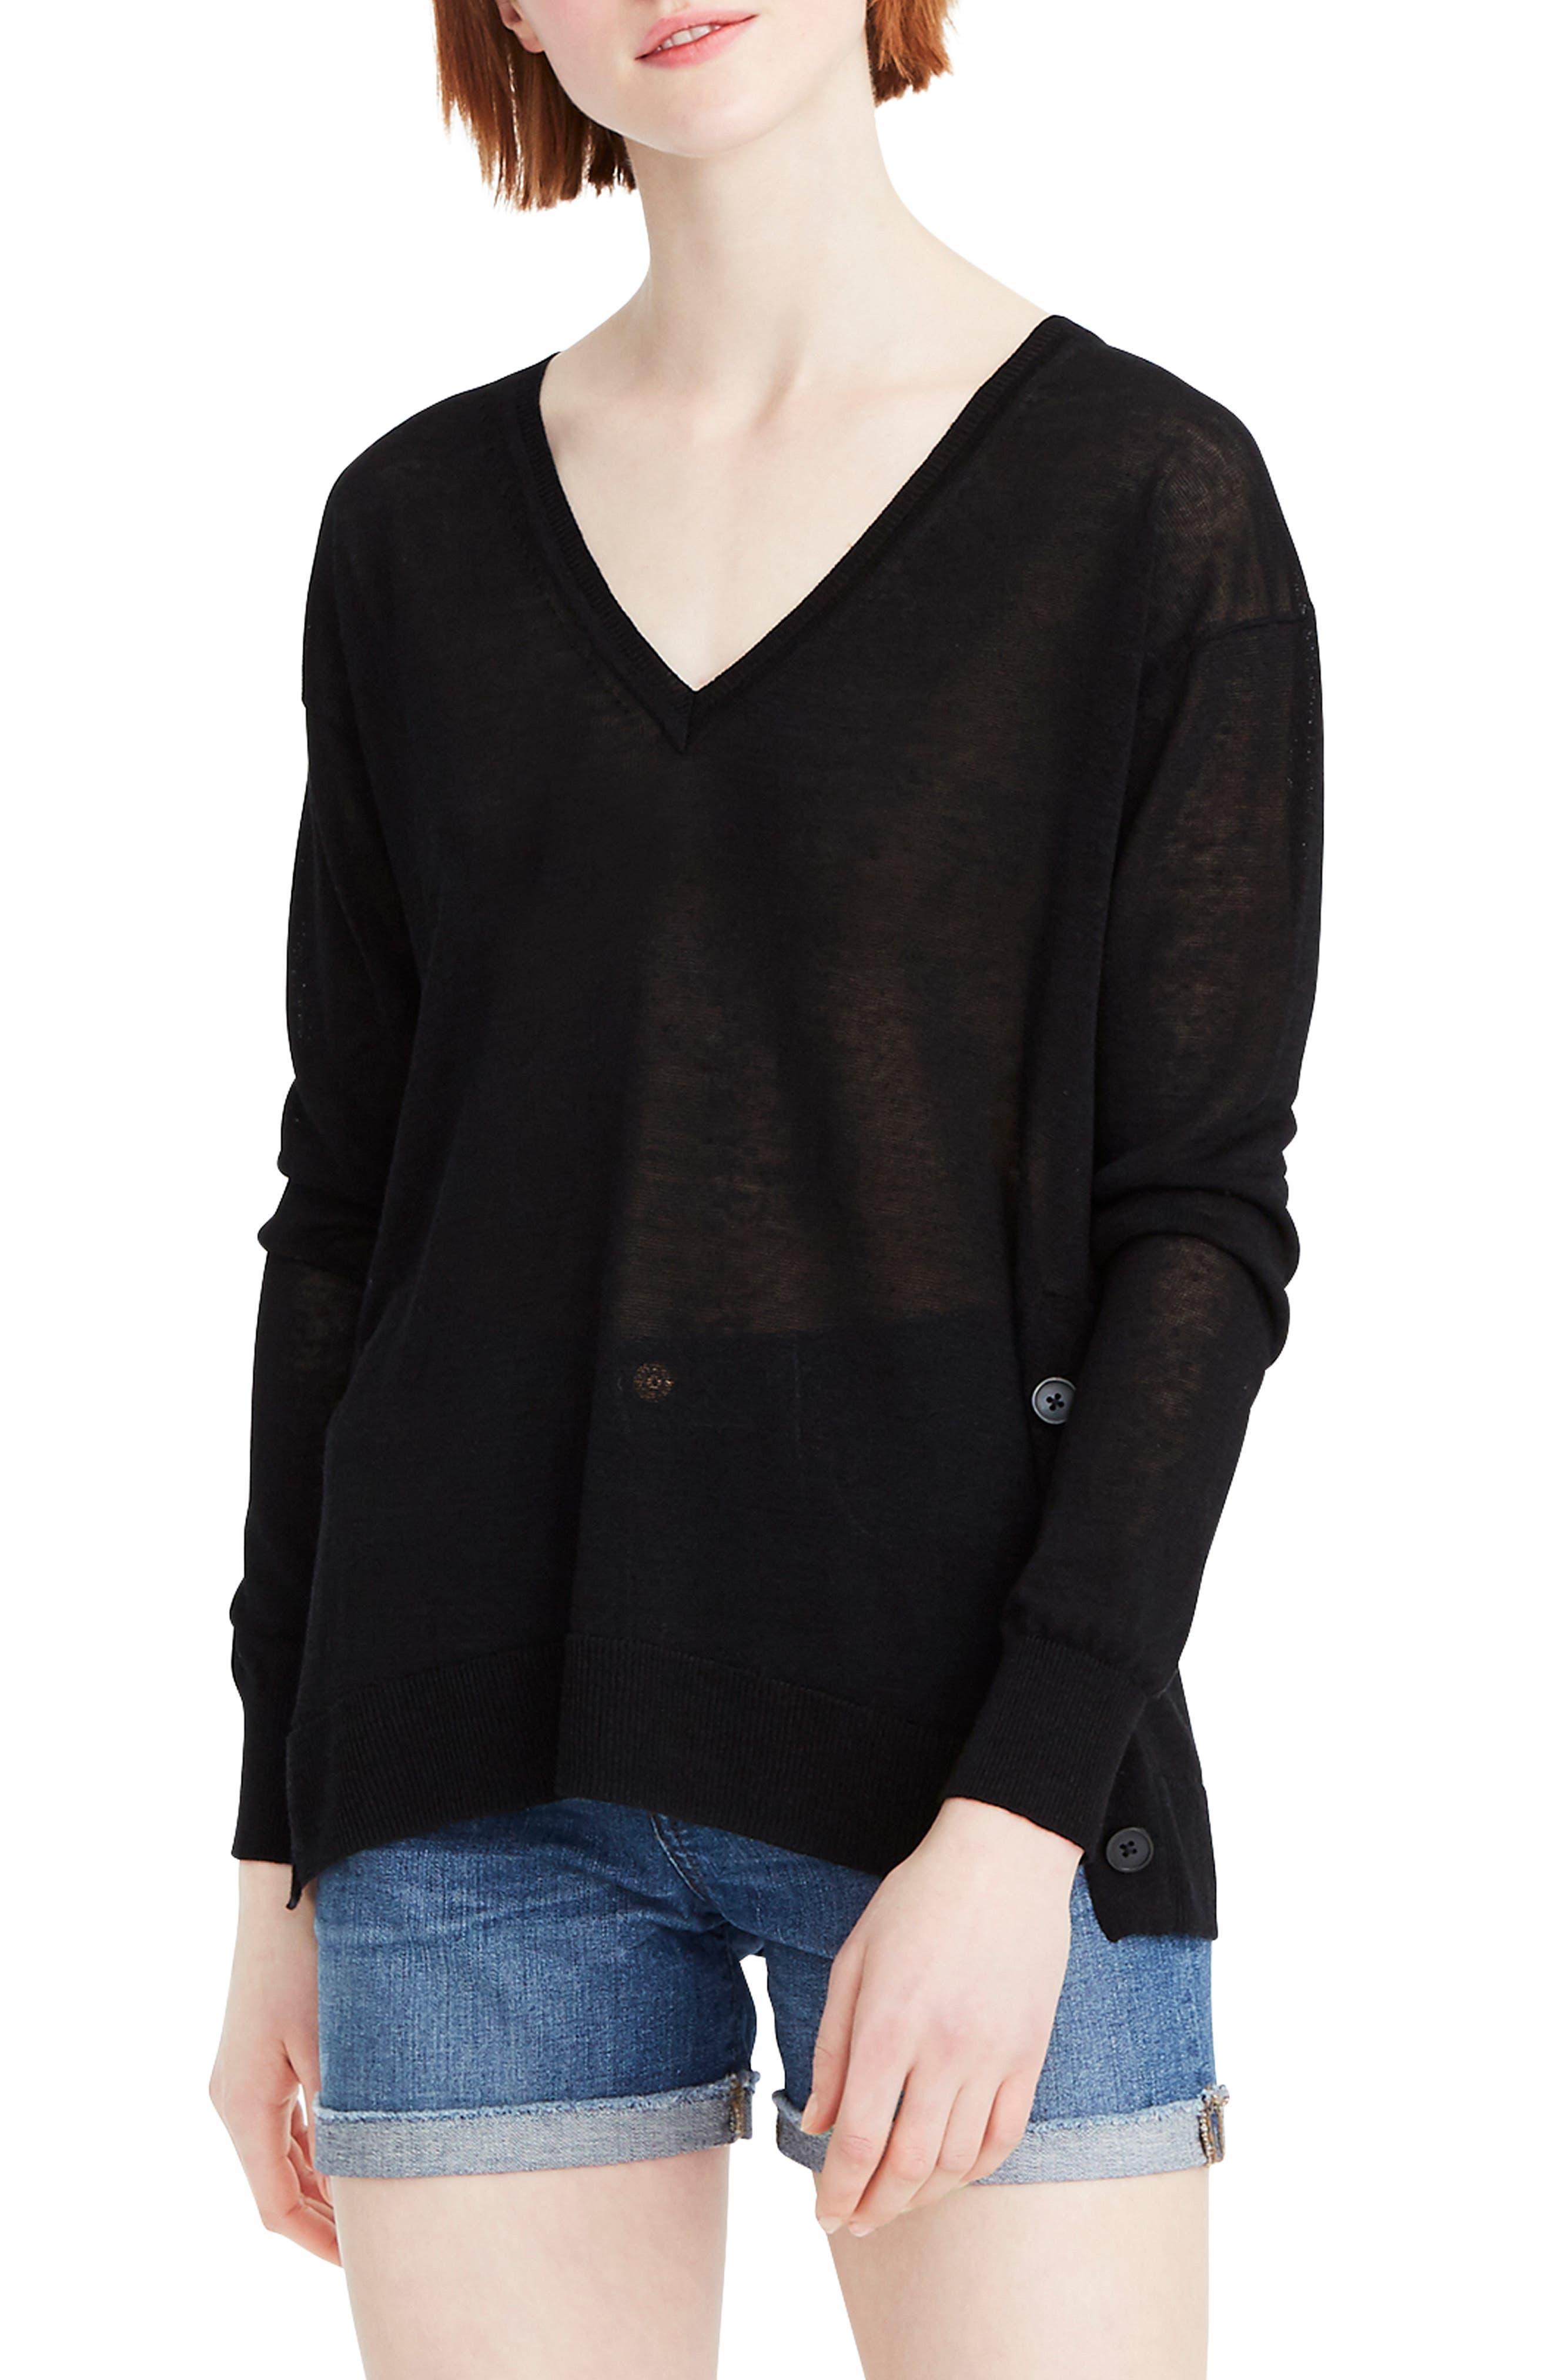 J.crew Side Button Linen Blend V-Neck Sweater, Black